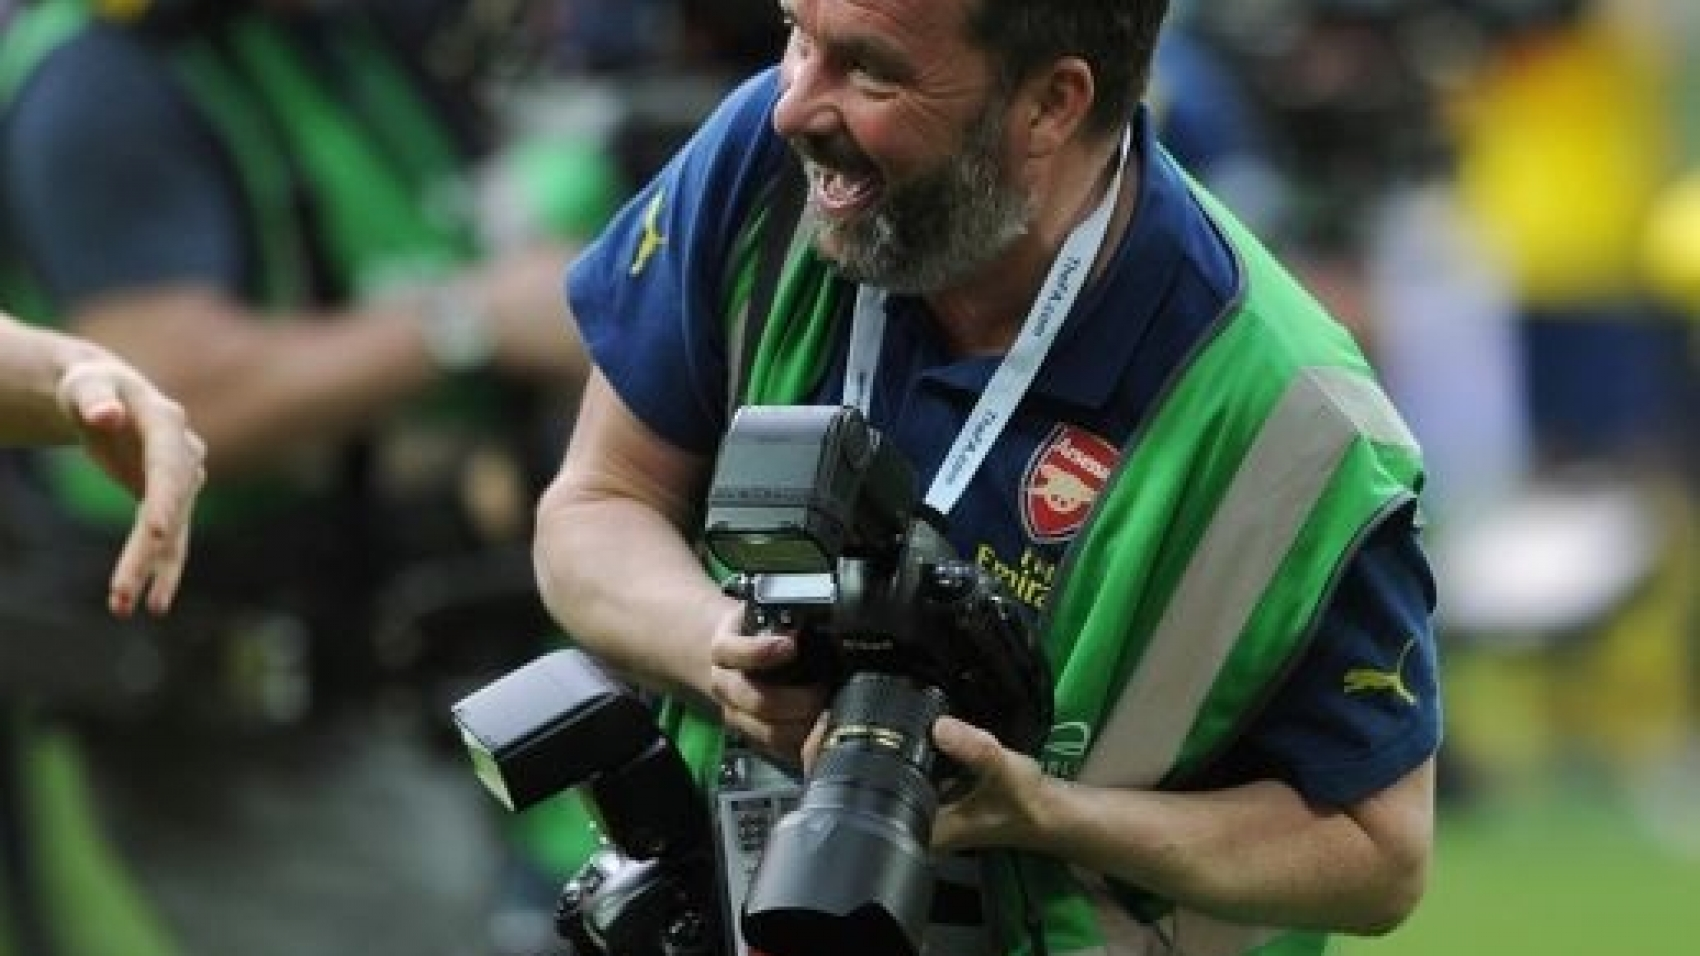 Arsenal photographer Stuart MacFarlane after the match. Arsenal 4:0 Aston Villa. FA Cup Final. Wembley Stadium, 30/5/15. Credit : Arsenal Football Club / David Price.